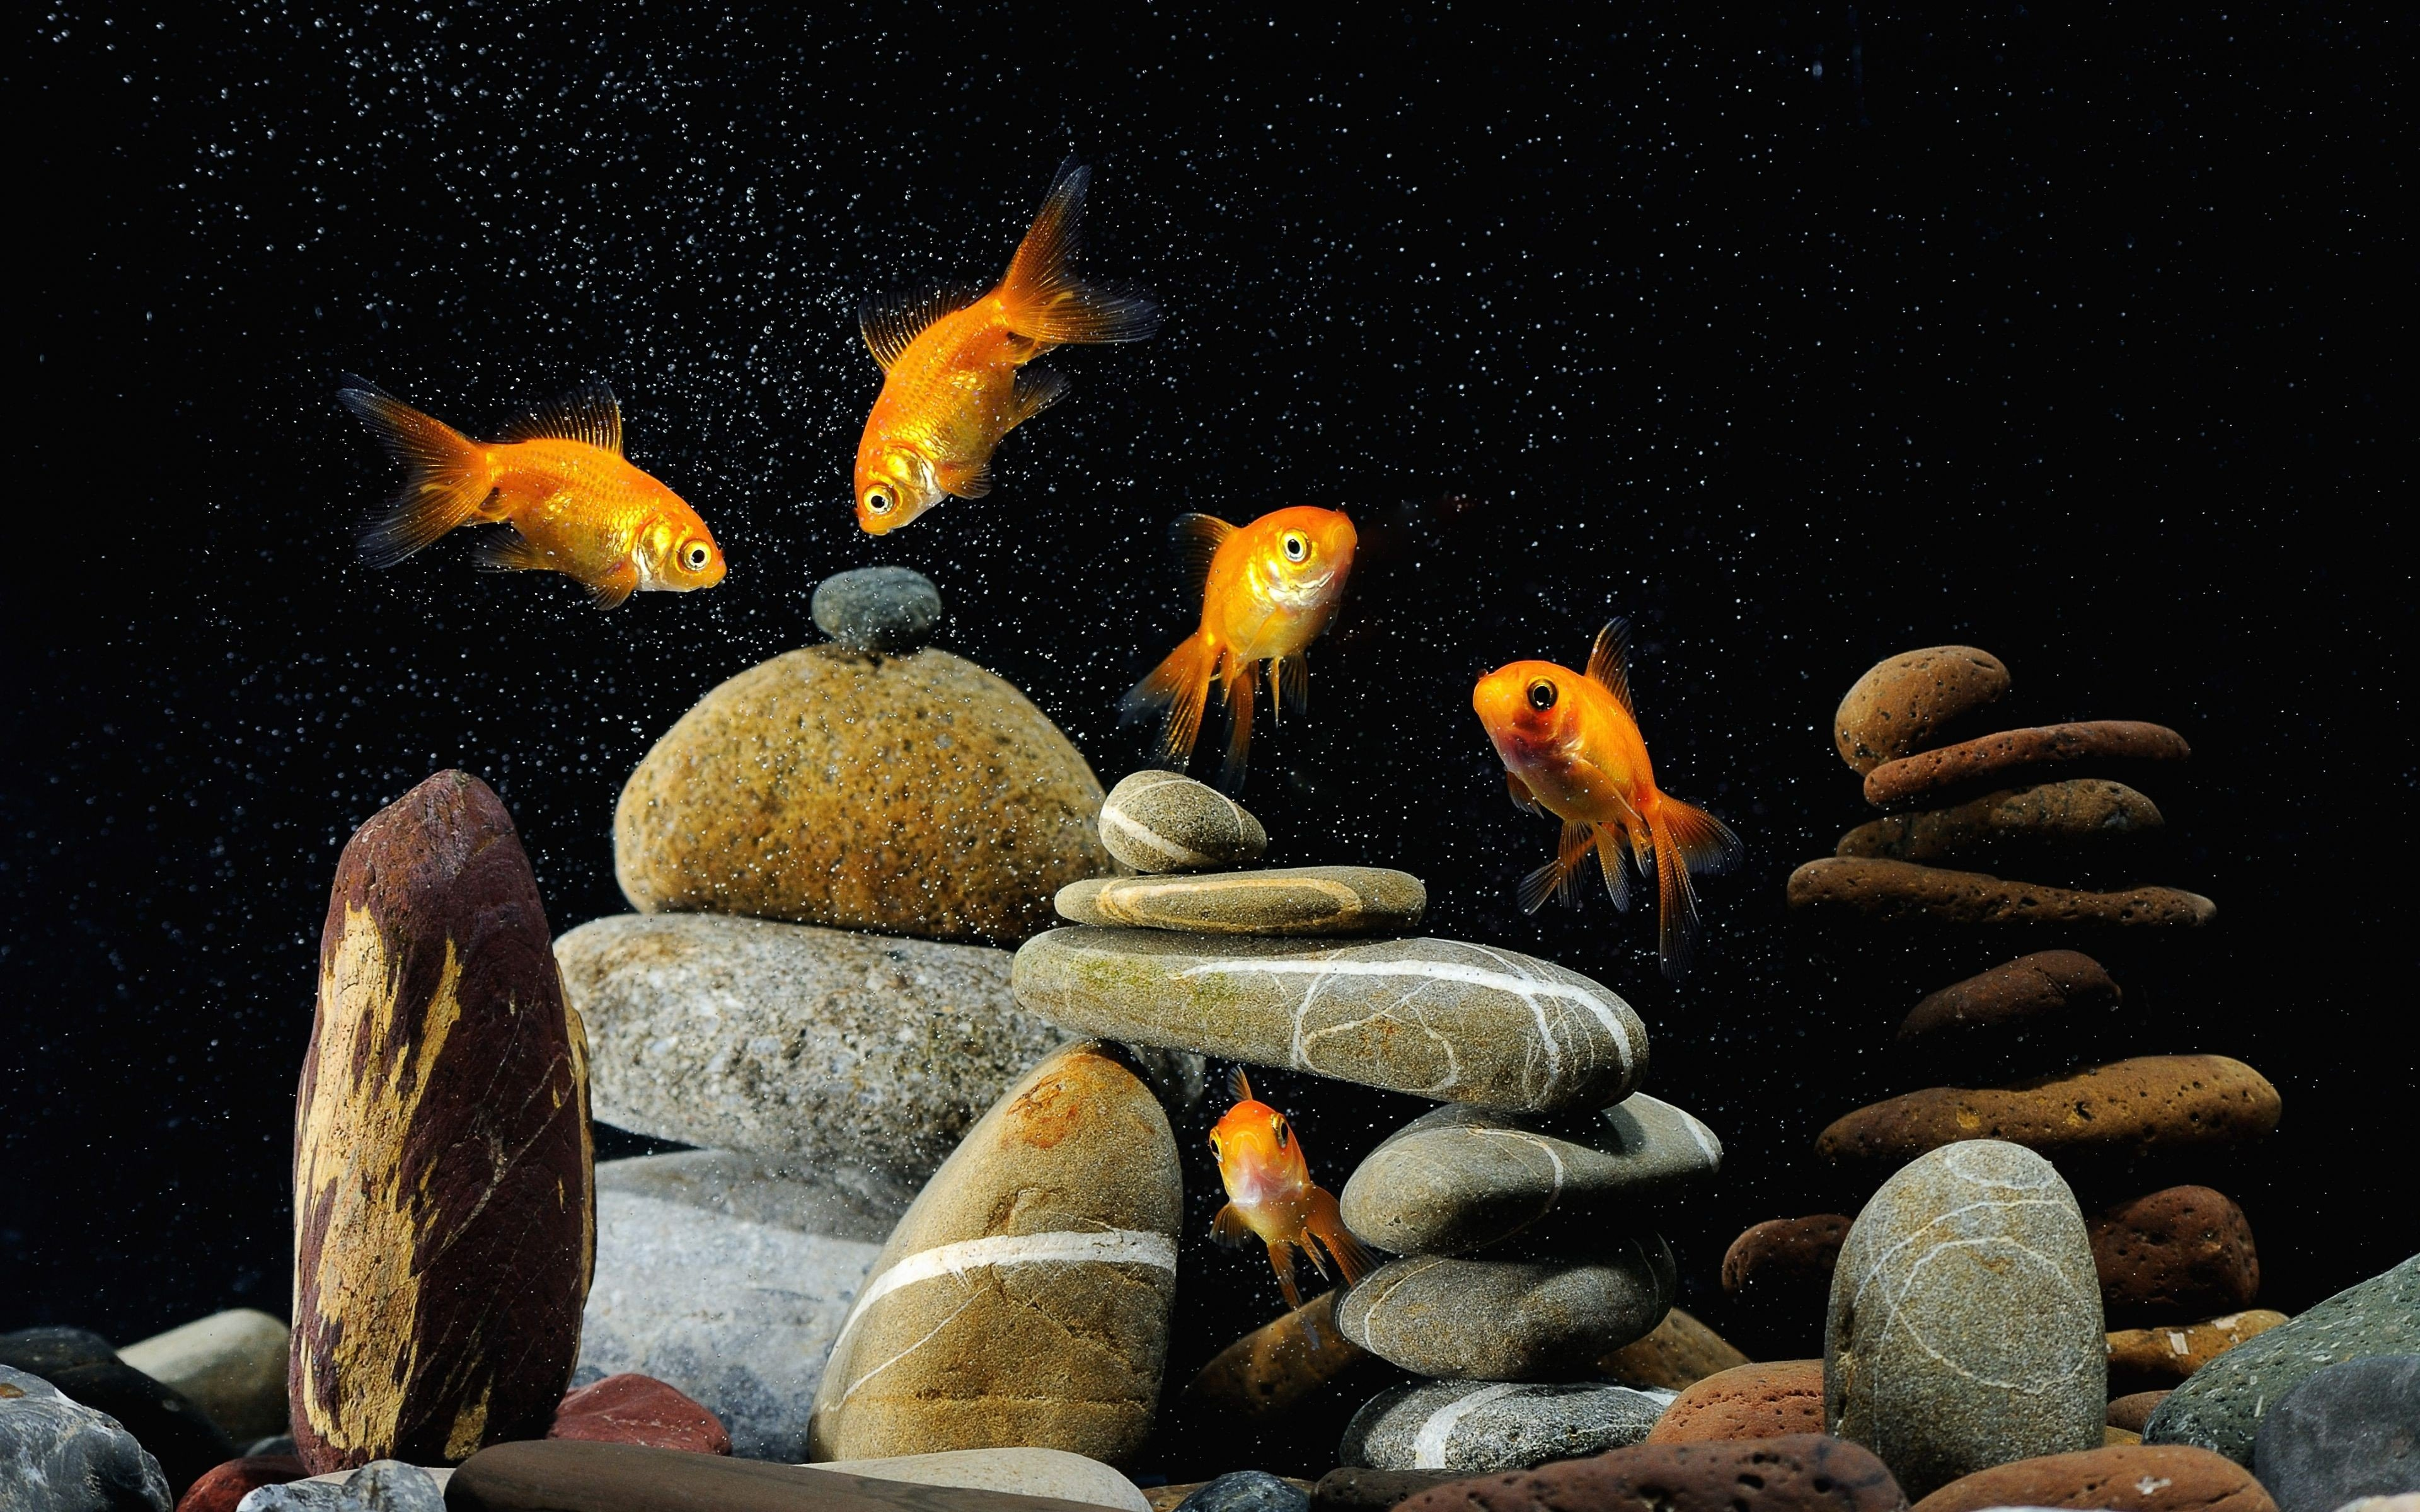 Aquarium wallpapers photos and desktop backgrounds up to 8k aquarium 11 wallpaper voltagebd Images